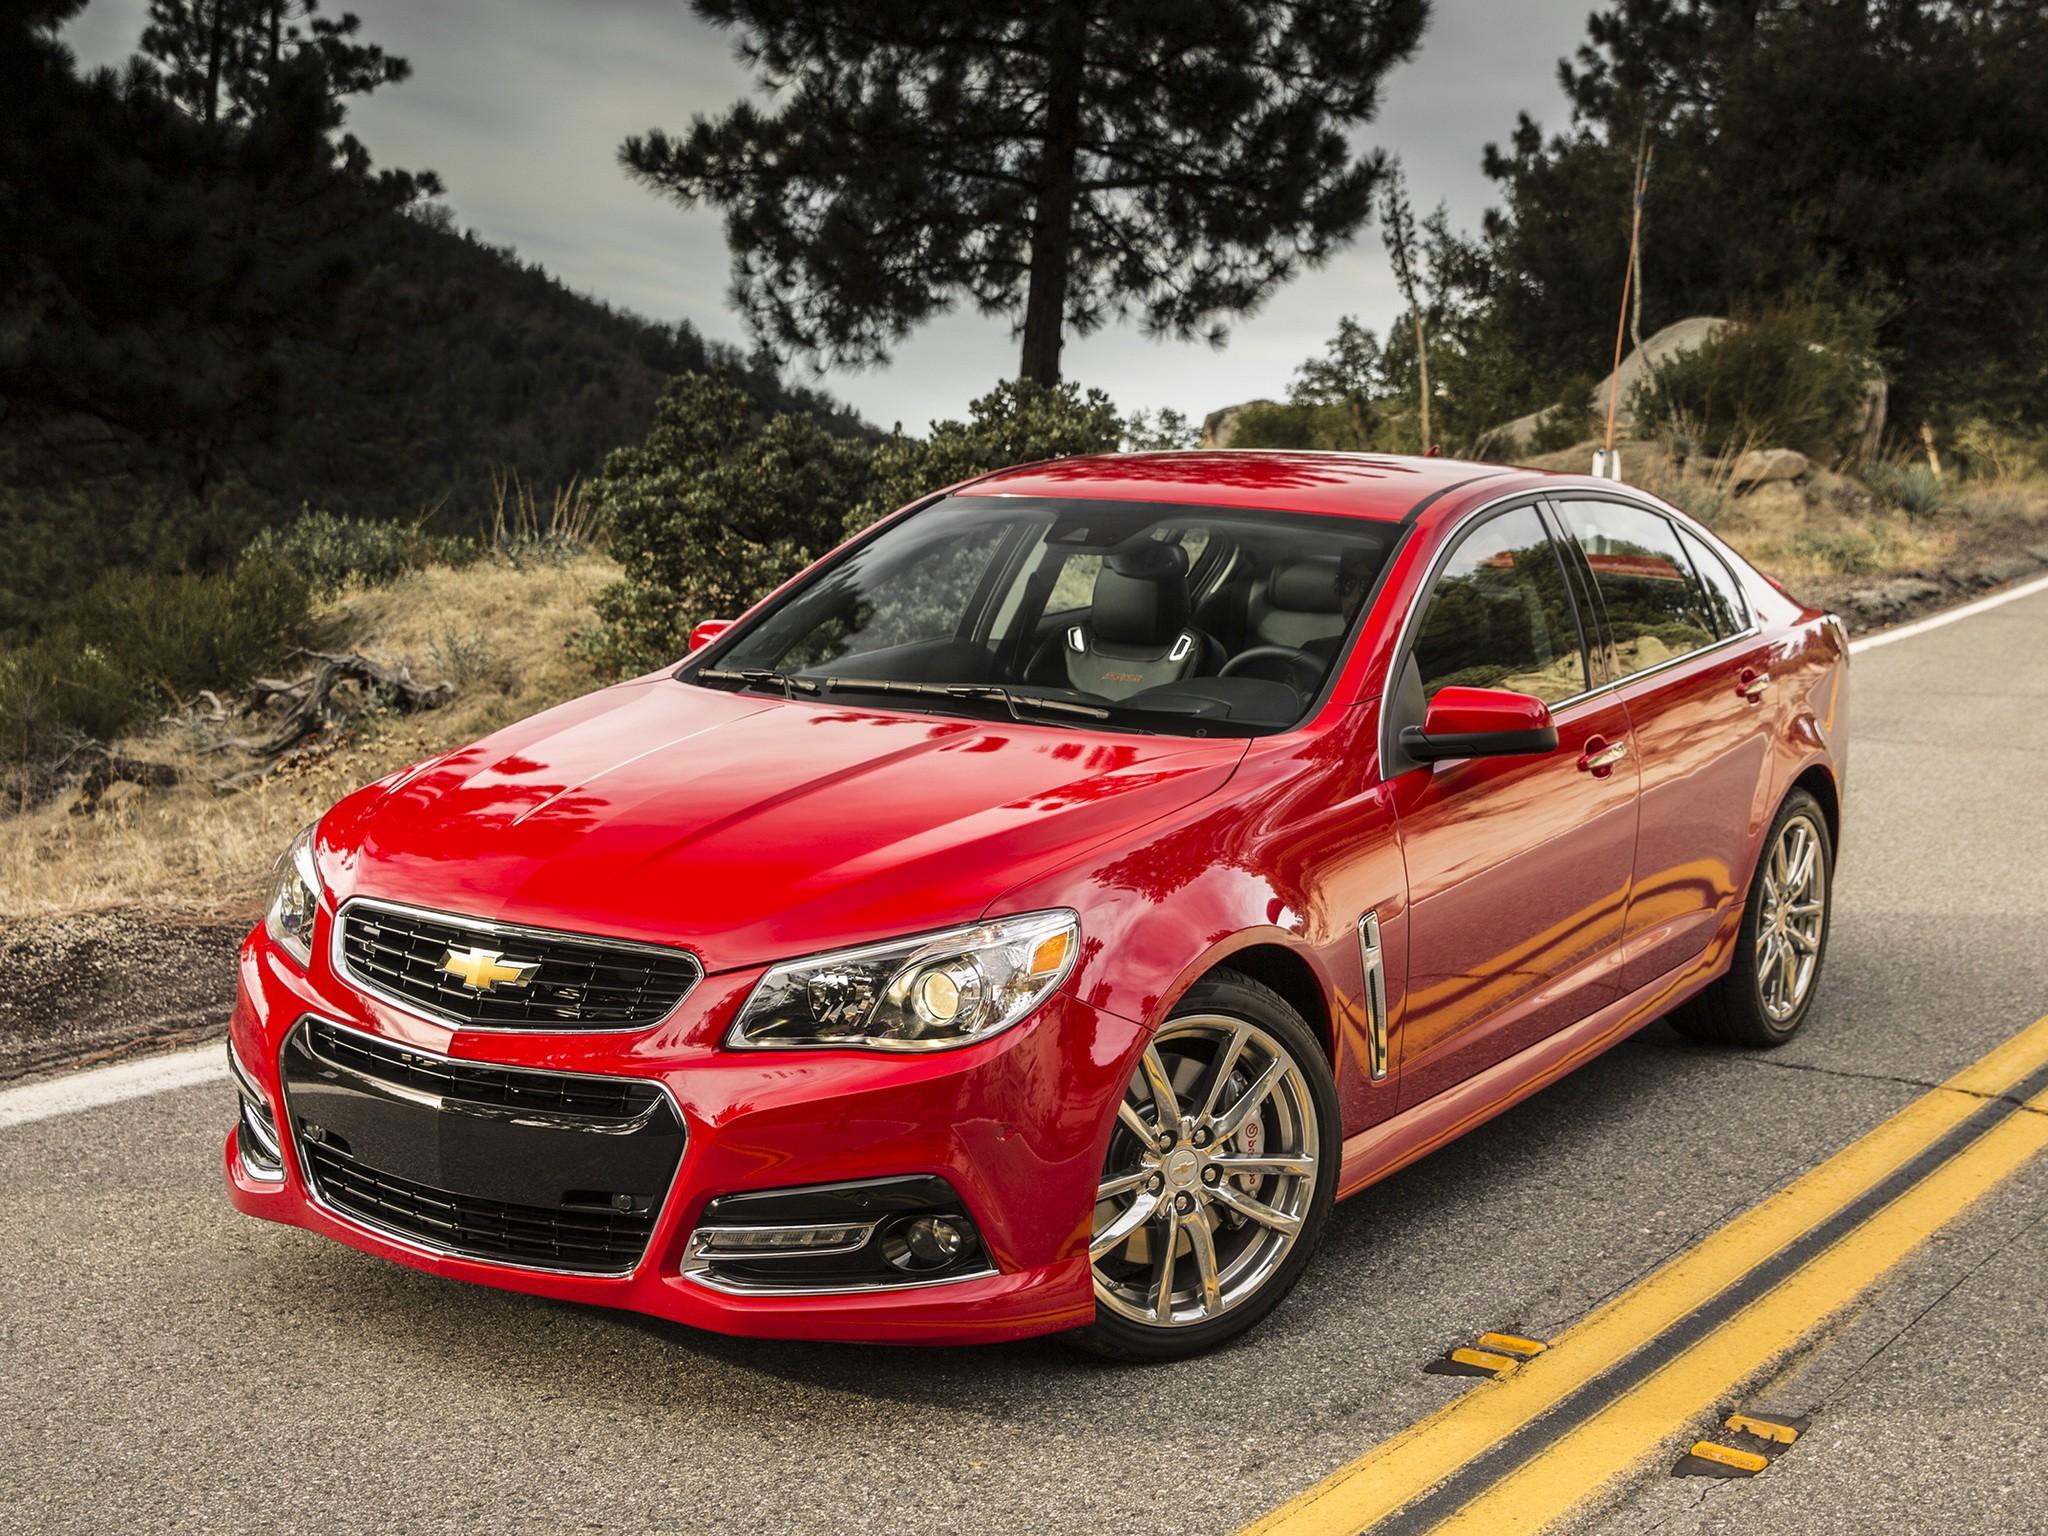 Chevrolet Ss Specs & Photos  2013, 2014, 2015, 2016, 2017